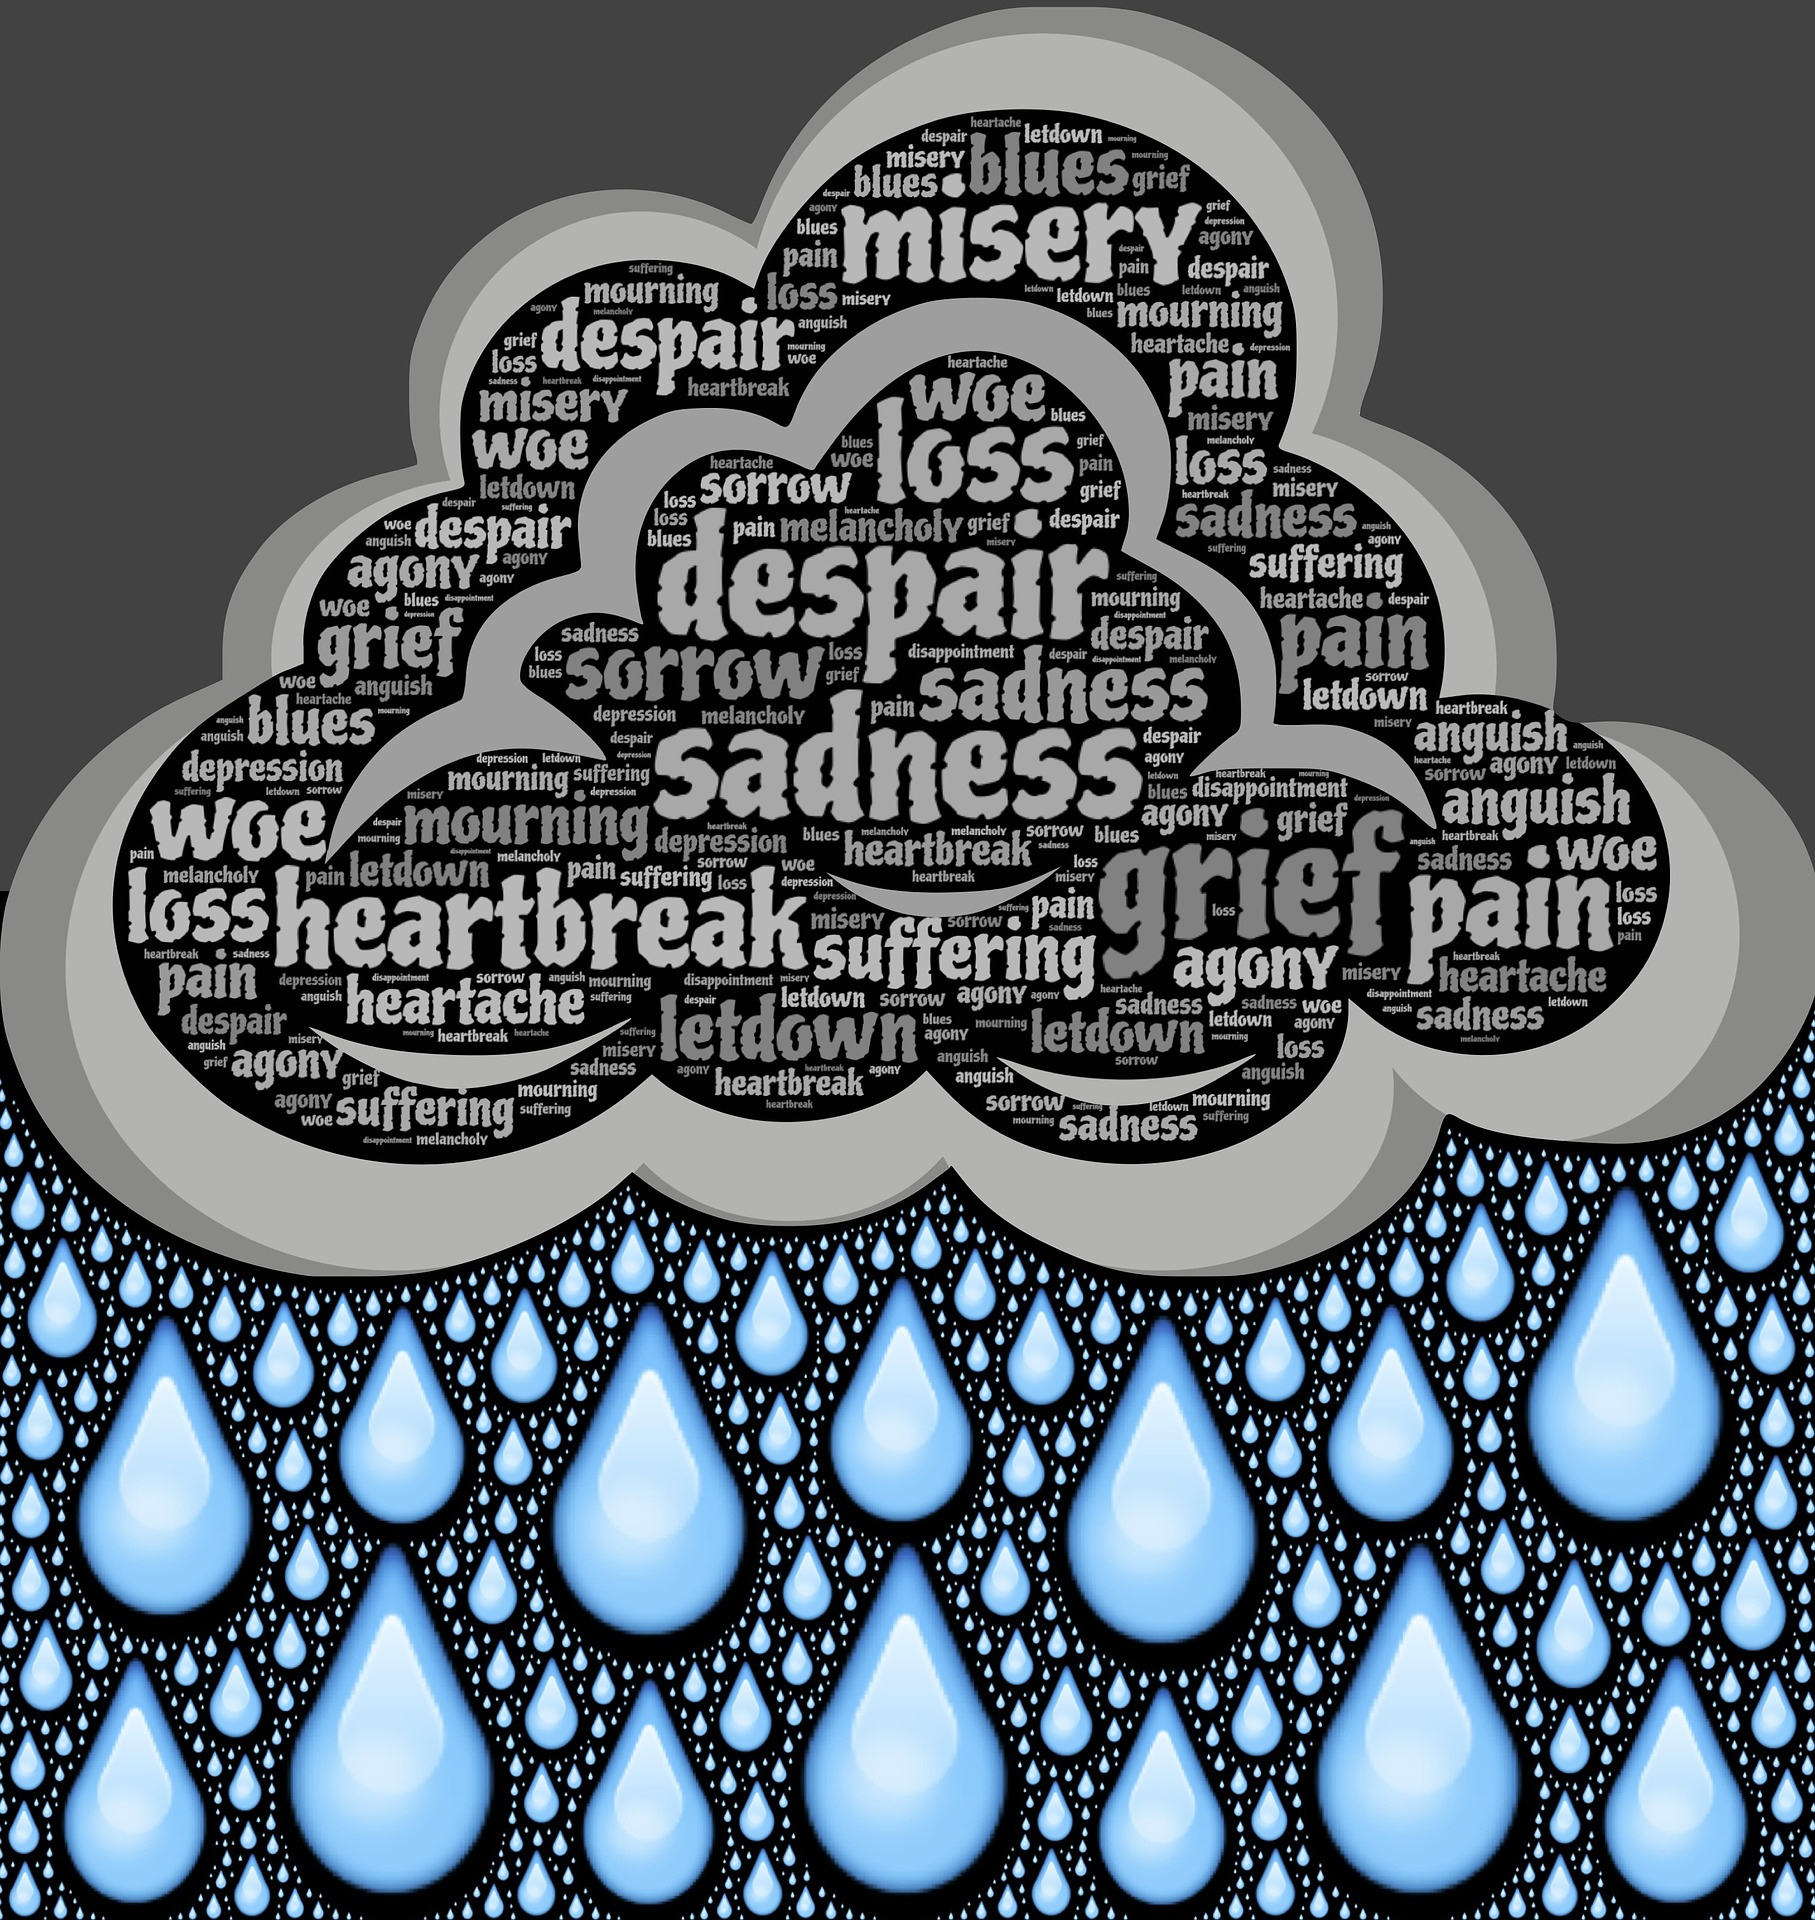 gestione del dolore fisico ed emotivo